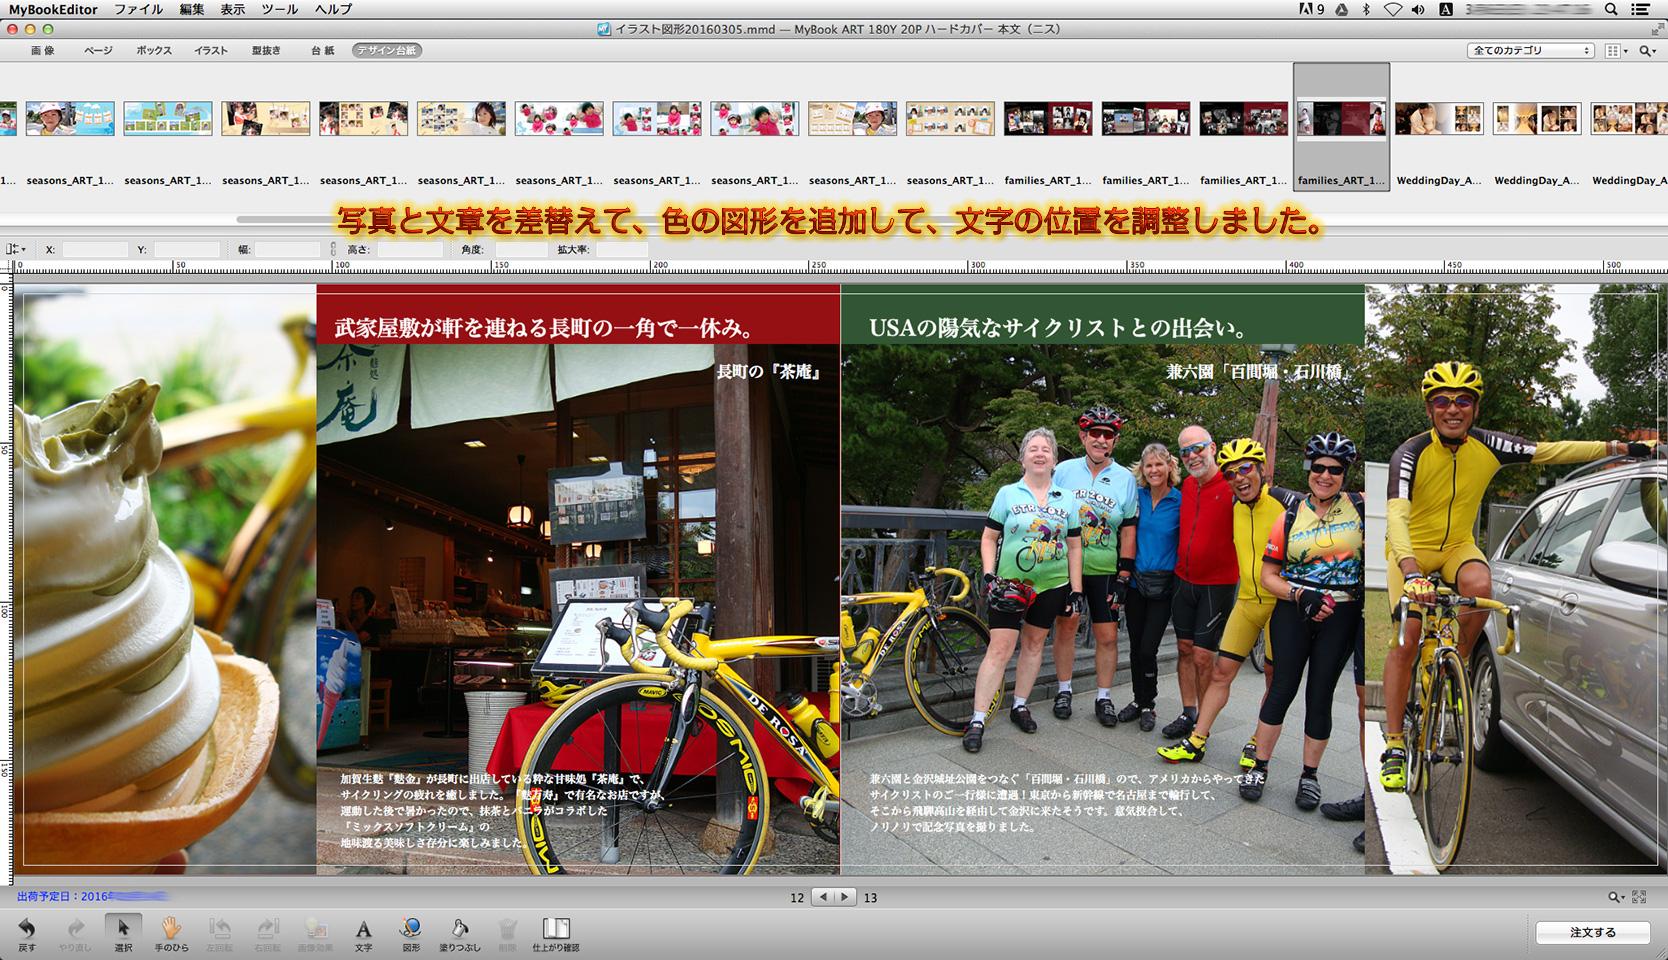 http://moritetsu.info/car/img/mb160design-new-2016-03-06-23-47-16ss.jpg